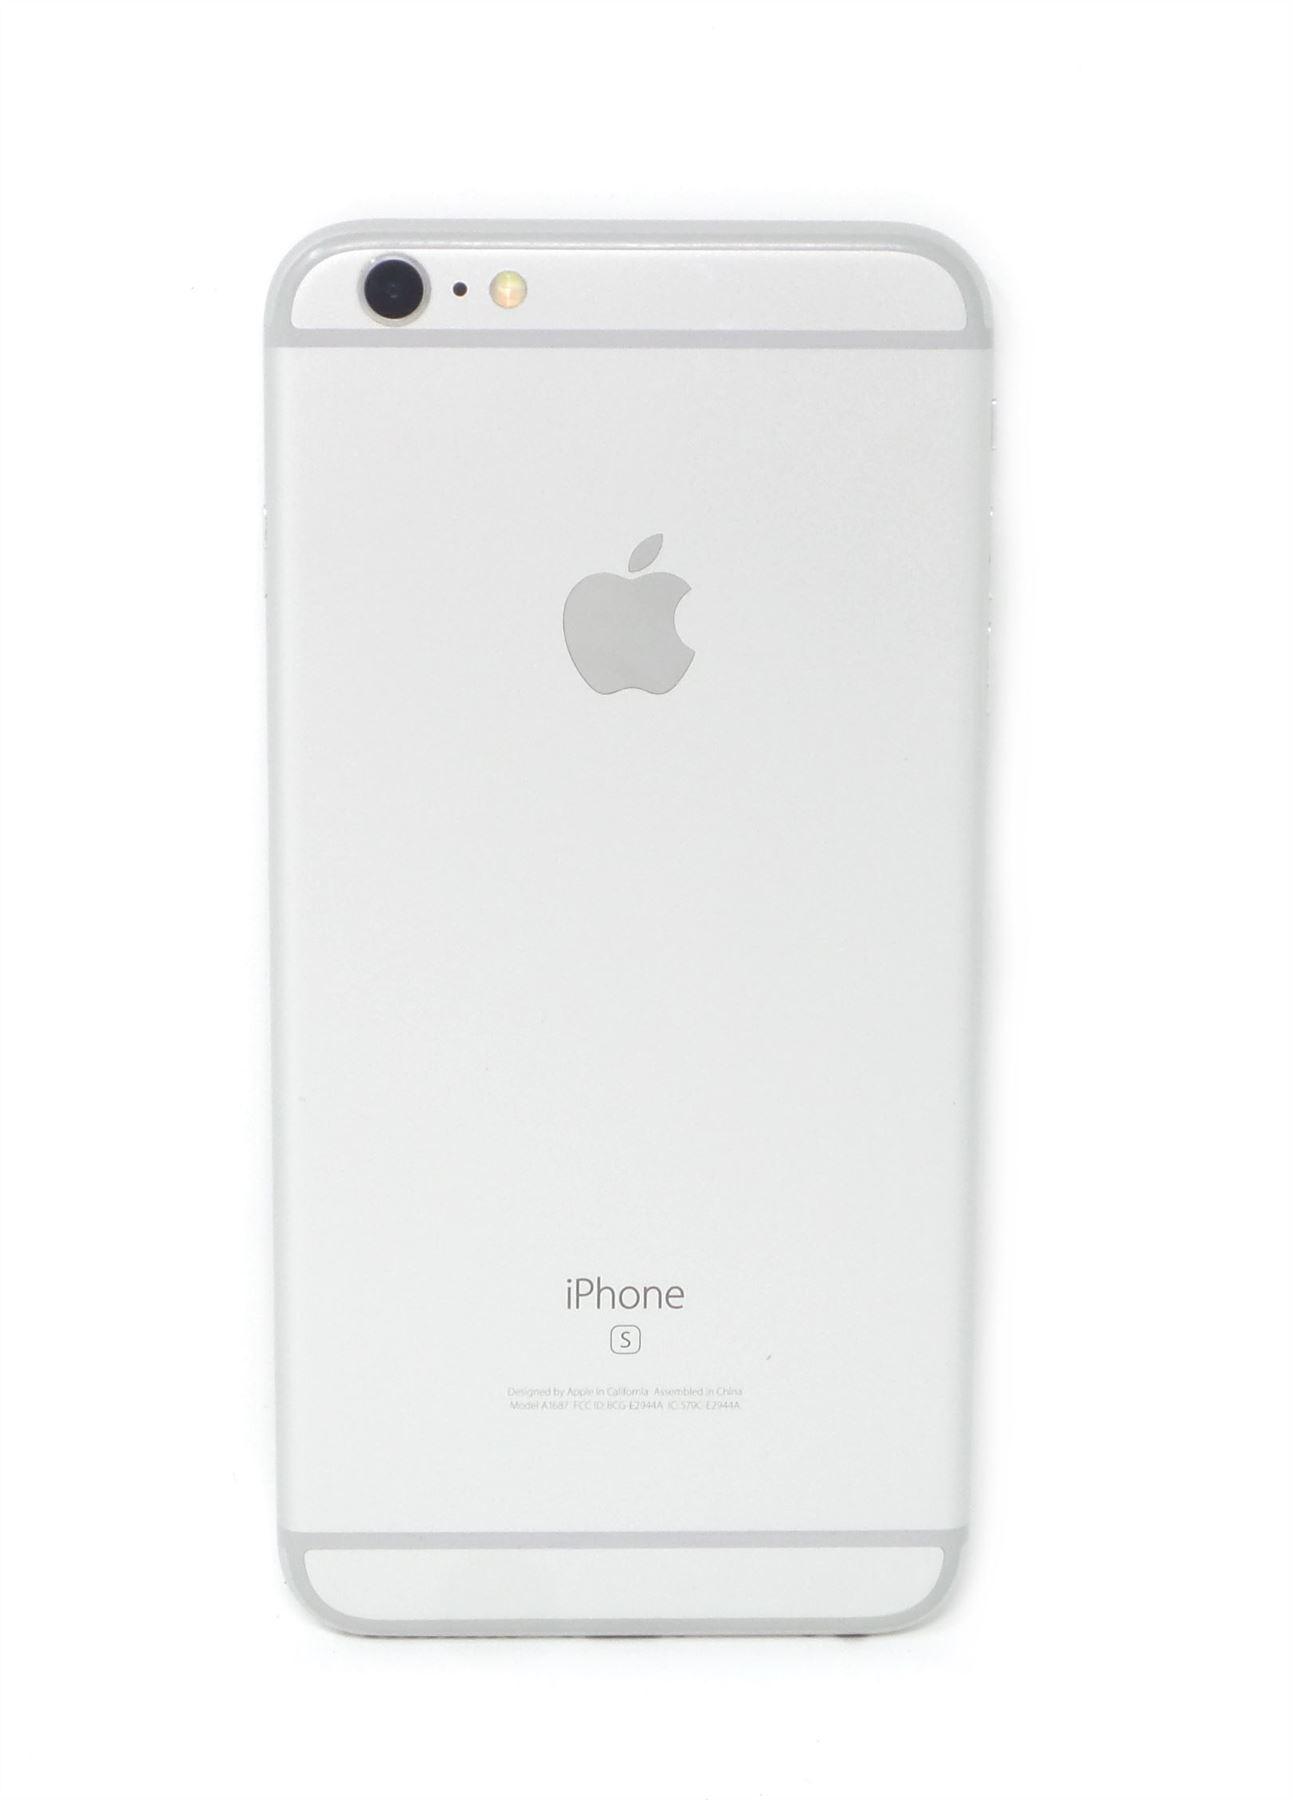 Apple-iPhone-6S-Plus-Carrier-Options-AT-amp-T-T-Mobile-Verizon-Unlocked-16-64-128GB thumbnail 18